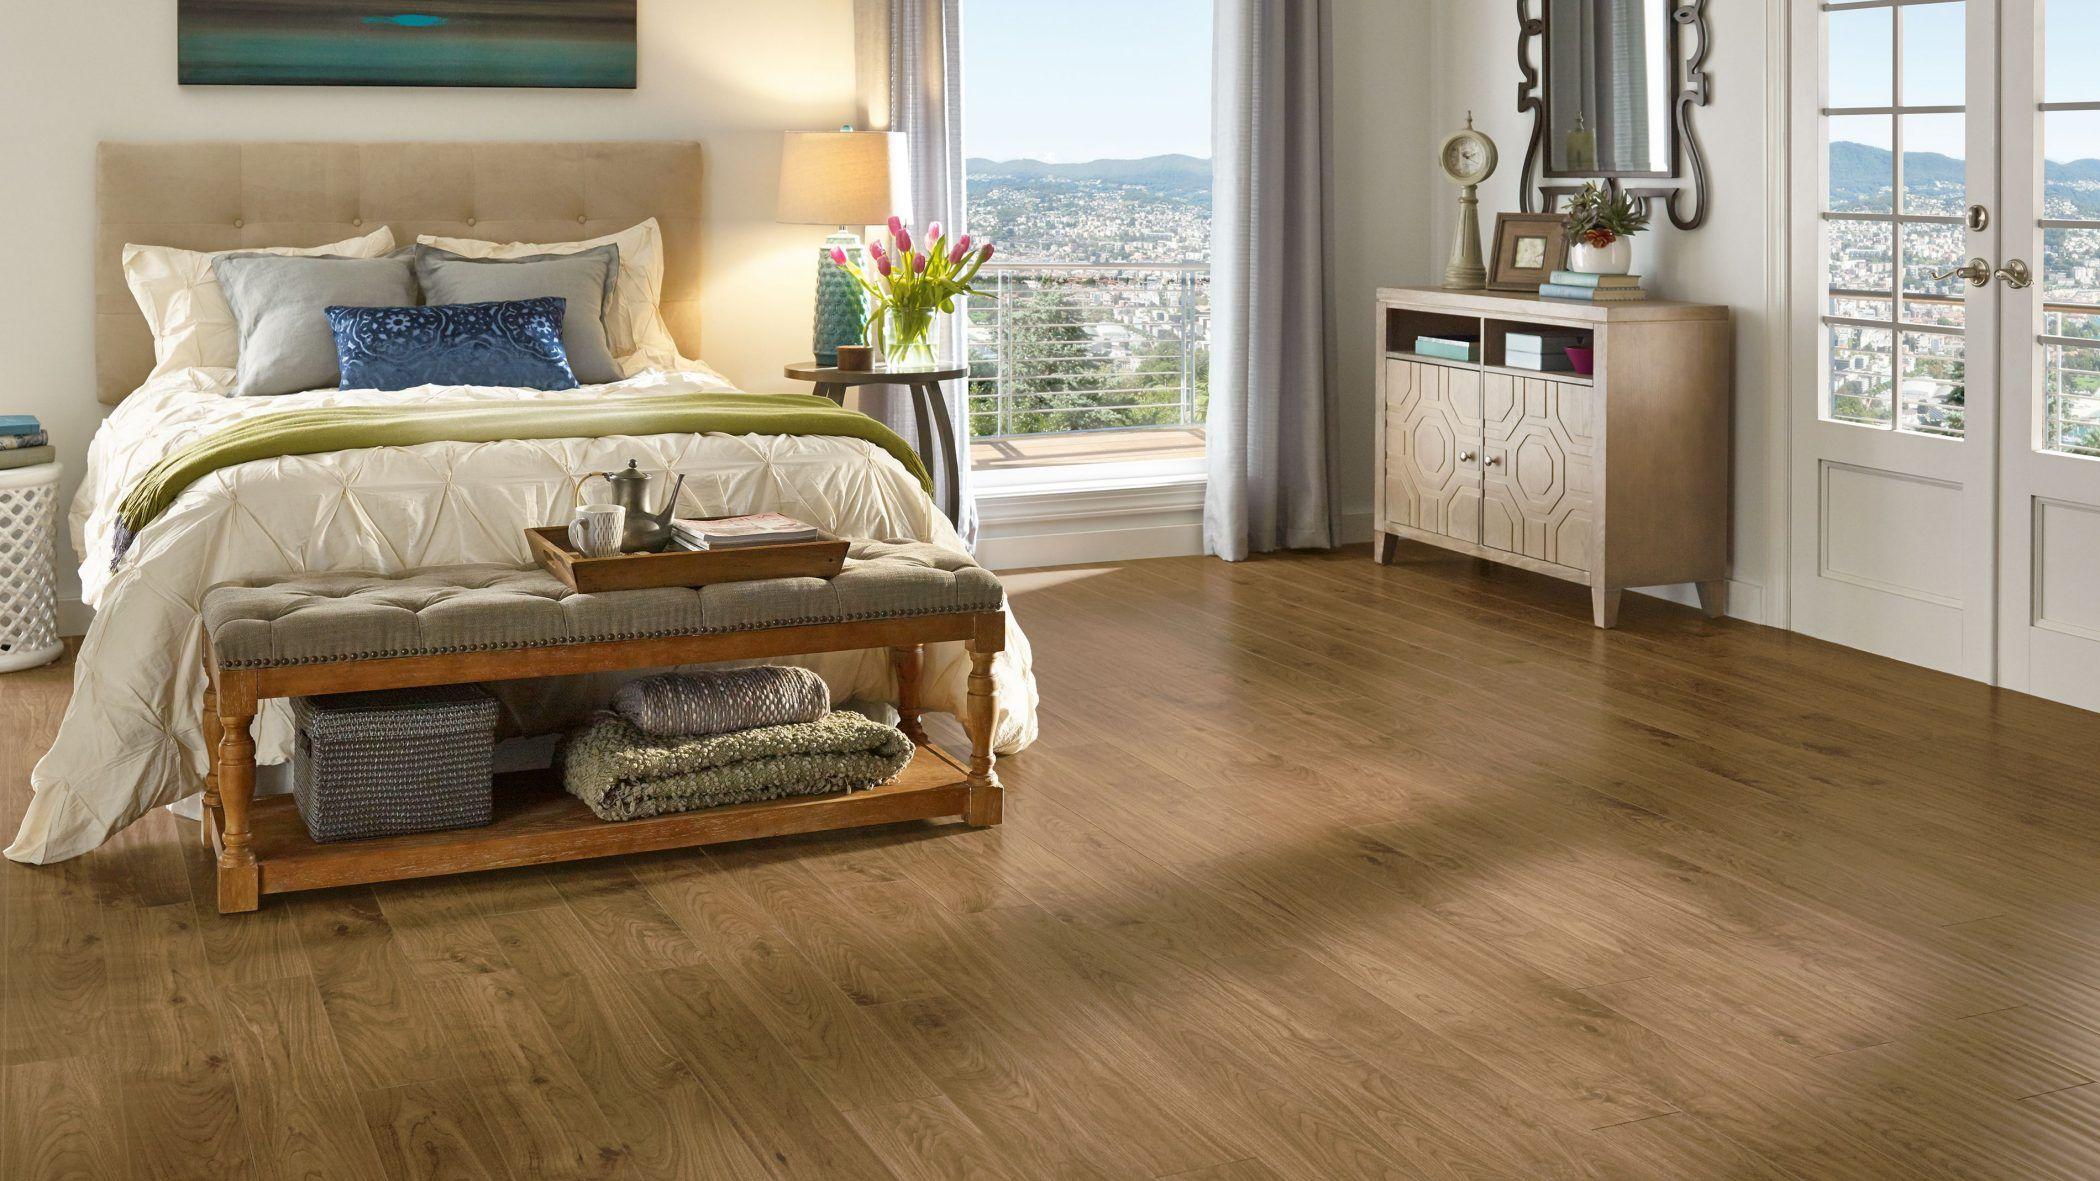 laminate flooring colors styles discover premium wood-look laminate flooring in a variety of rustic styles,  colors ZAWIDZV